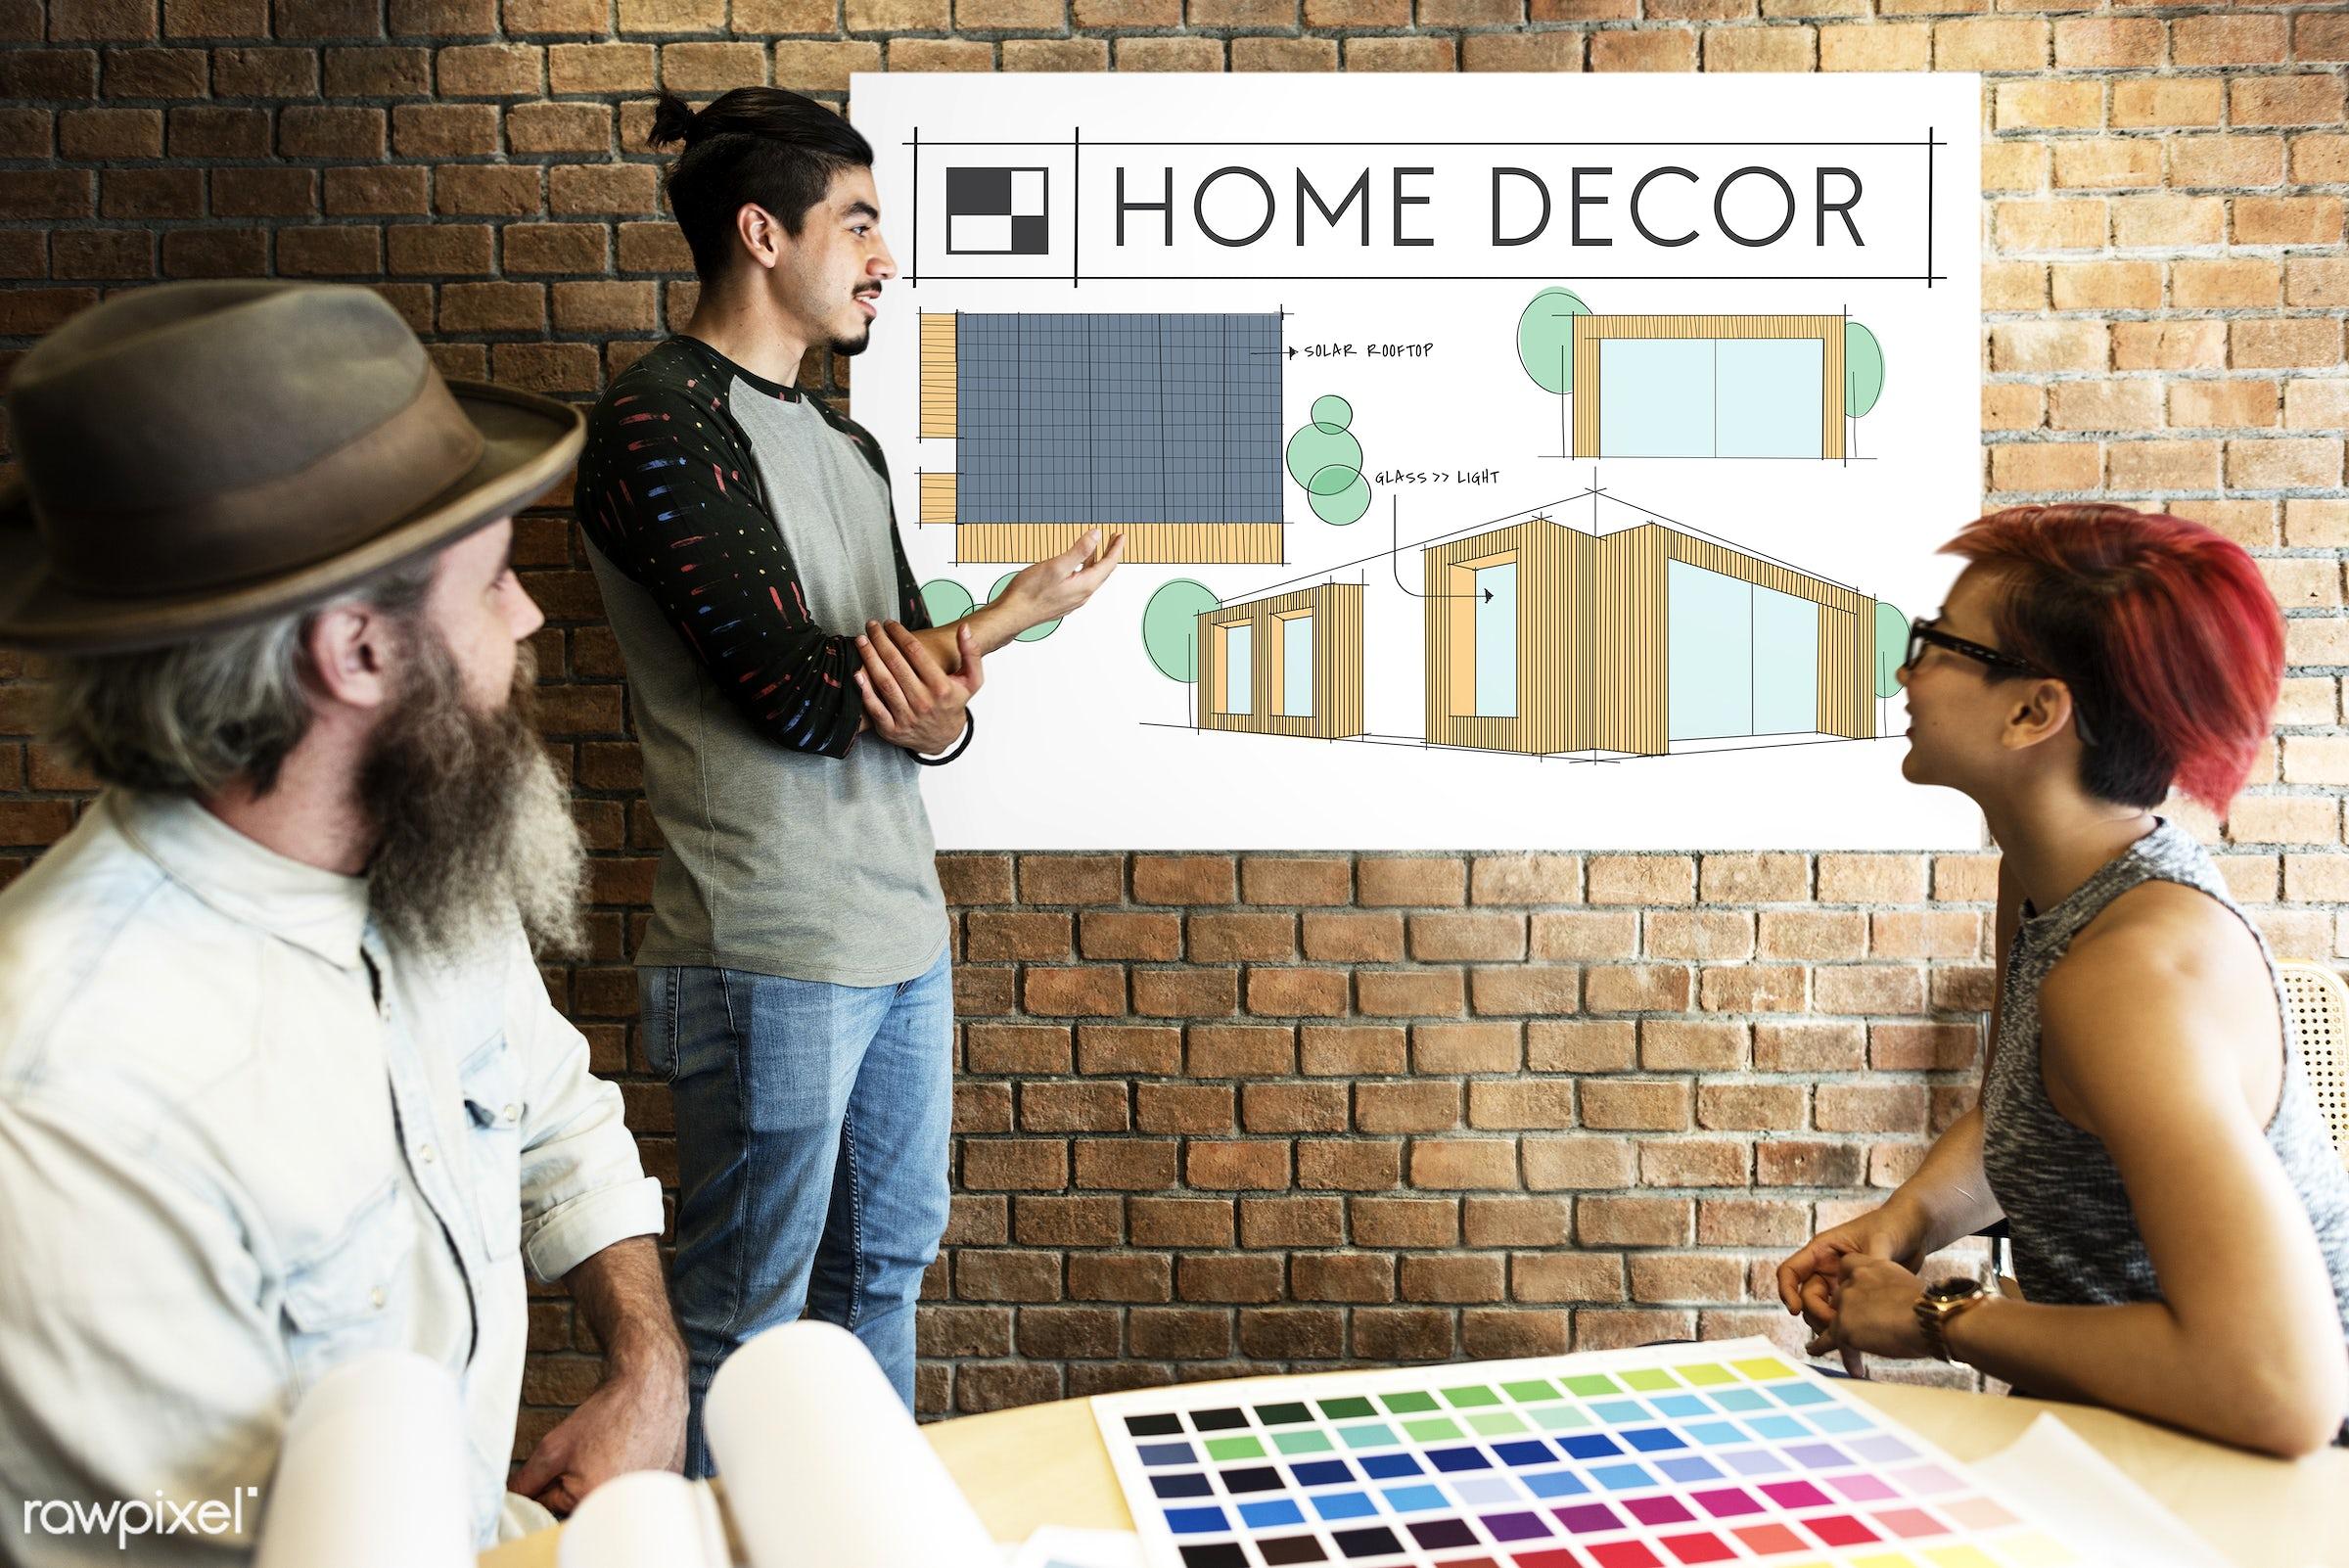 architecture, art, beard, board, brick wall, building, chart, color chart, colors, contemporary, creative, decor, decoration...